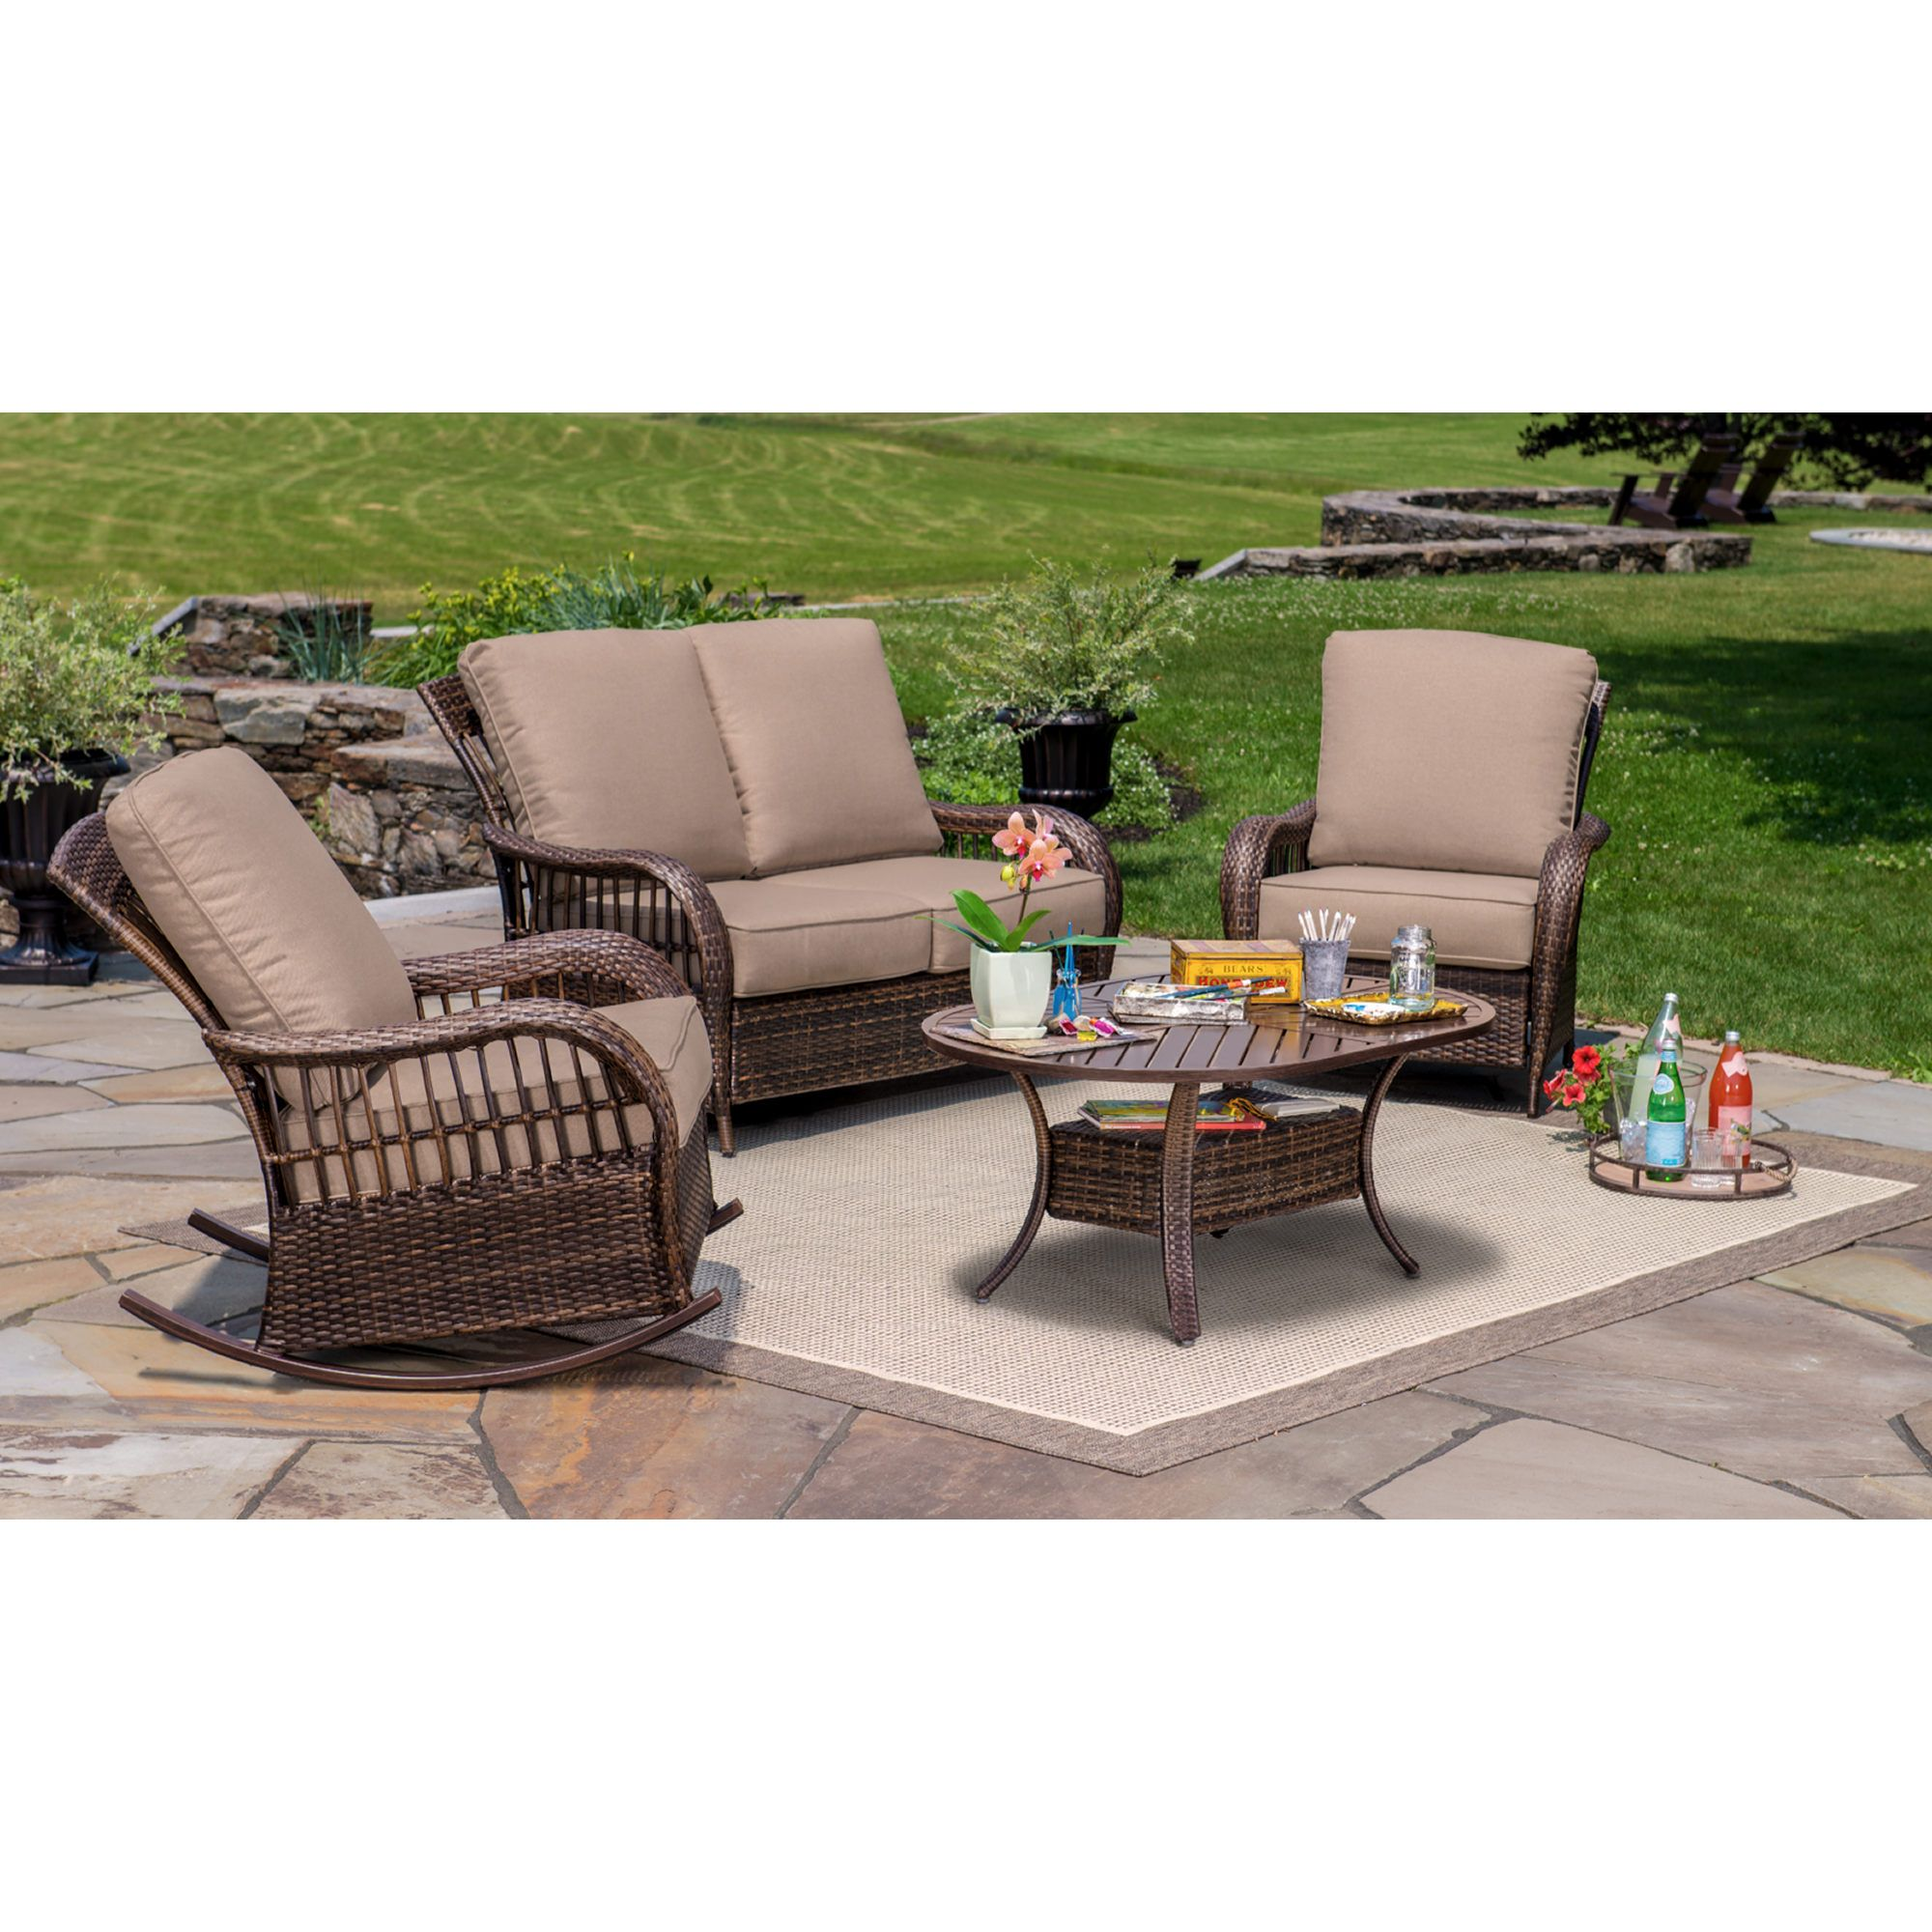 jensen club set outdoor fire calais furniture of new chat bjs pit with wholesale berkley best patio pc